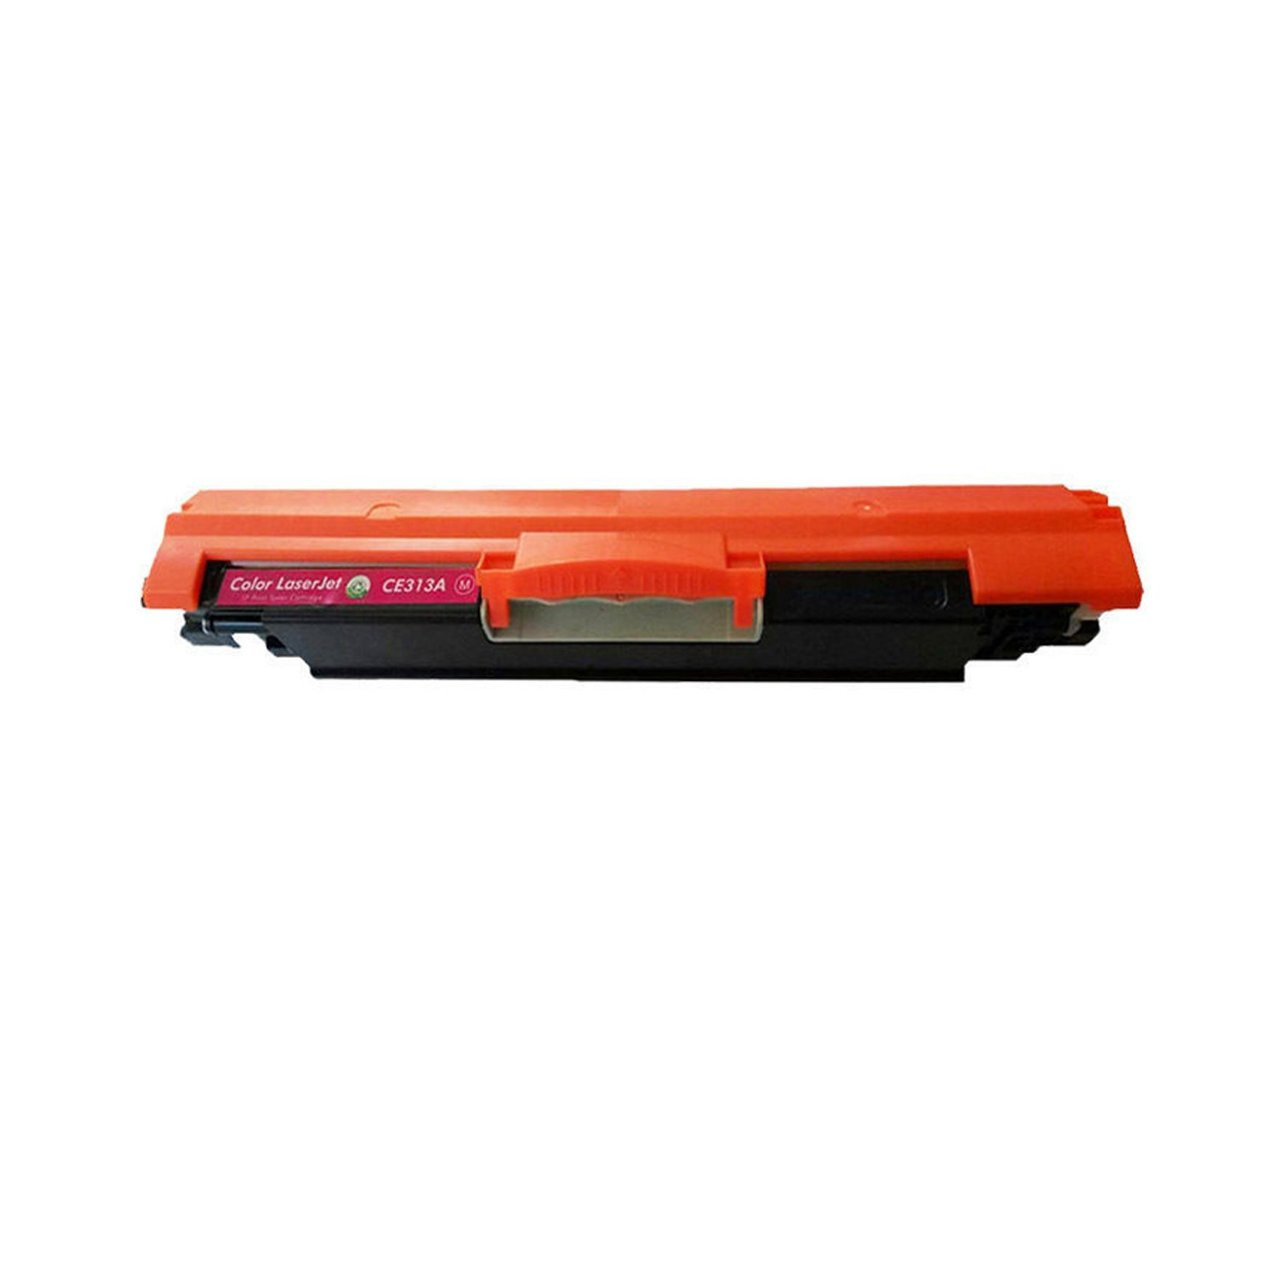 2pk CE310A 126A Black Toner Cartridge for HP Pro 100 series